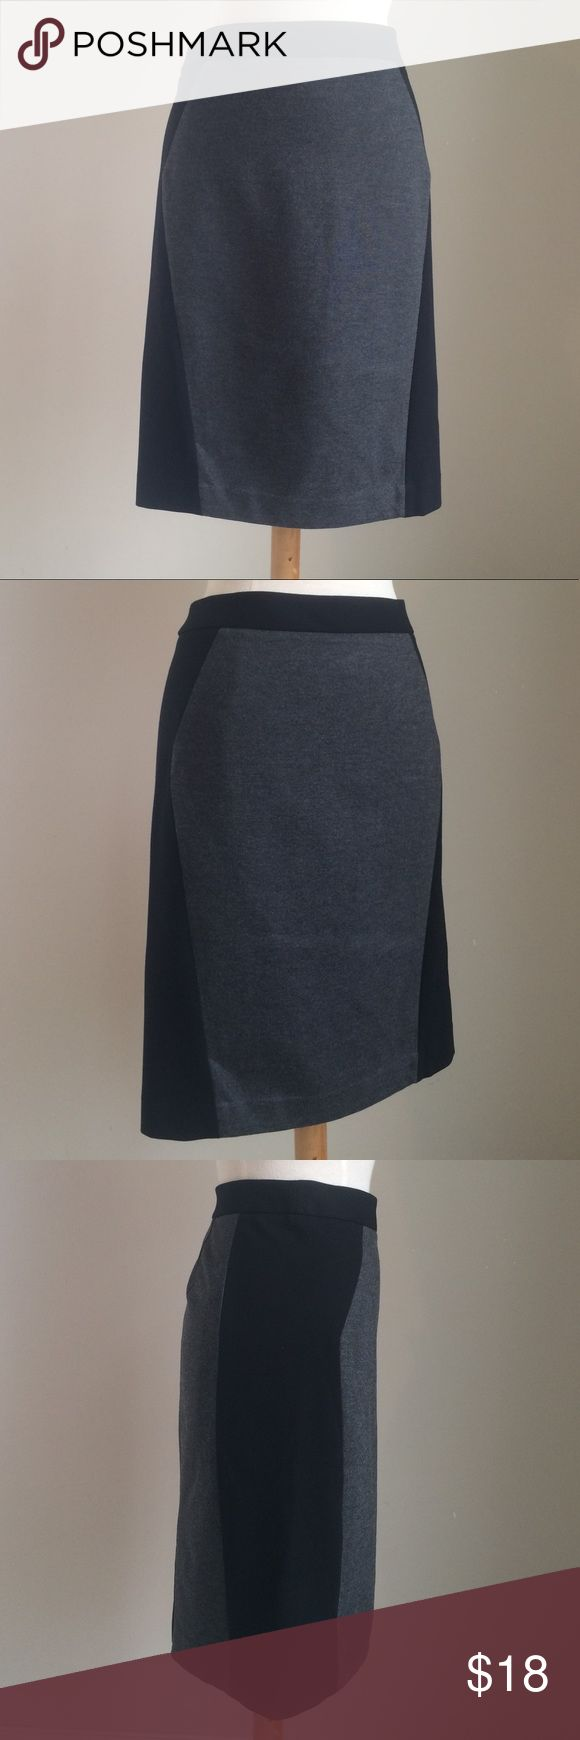 LOFT Pencil Skirt Ann Taylor LIFT grey with black side panels pencil skirt.   Size 10 Body:  71% rayon/25%nylon/4% spandex Side panels:  67% rayon/29% nylon/4%spandex  100100 LOFT Skirts Pencil